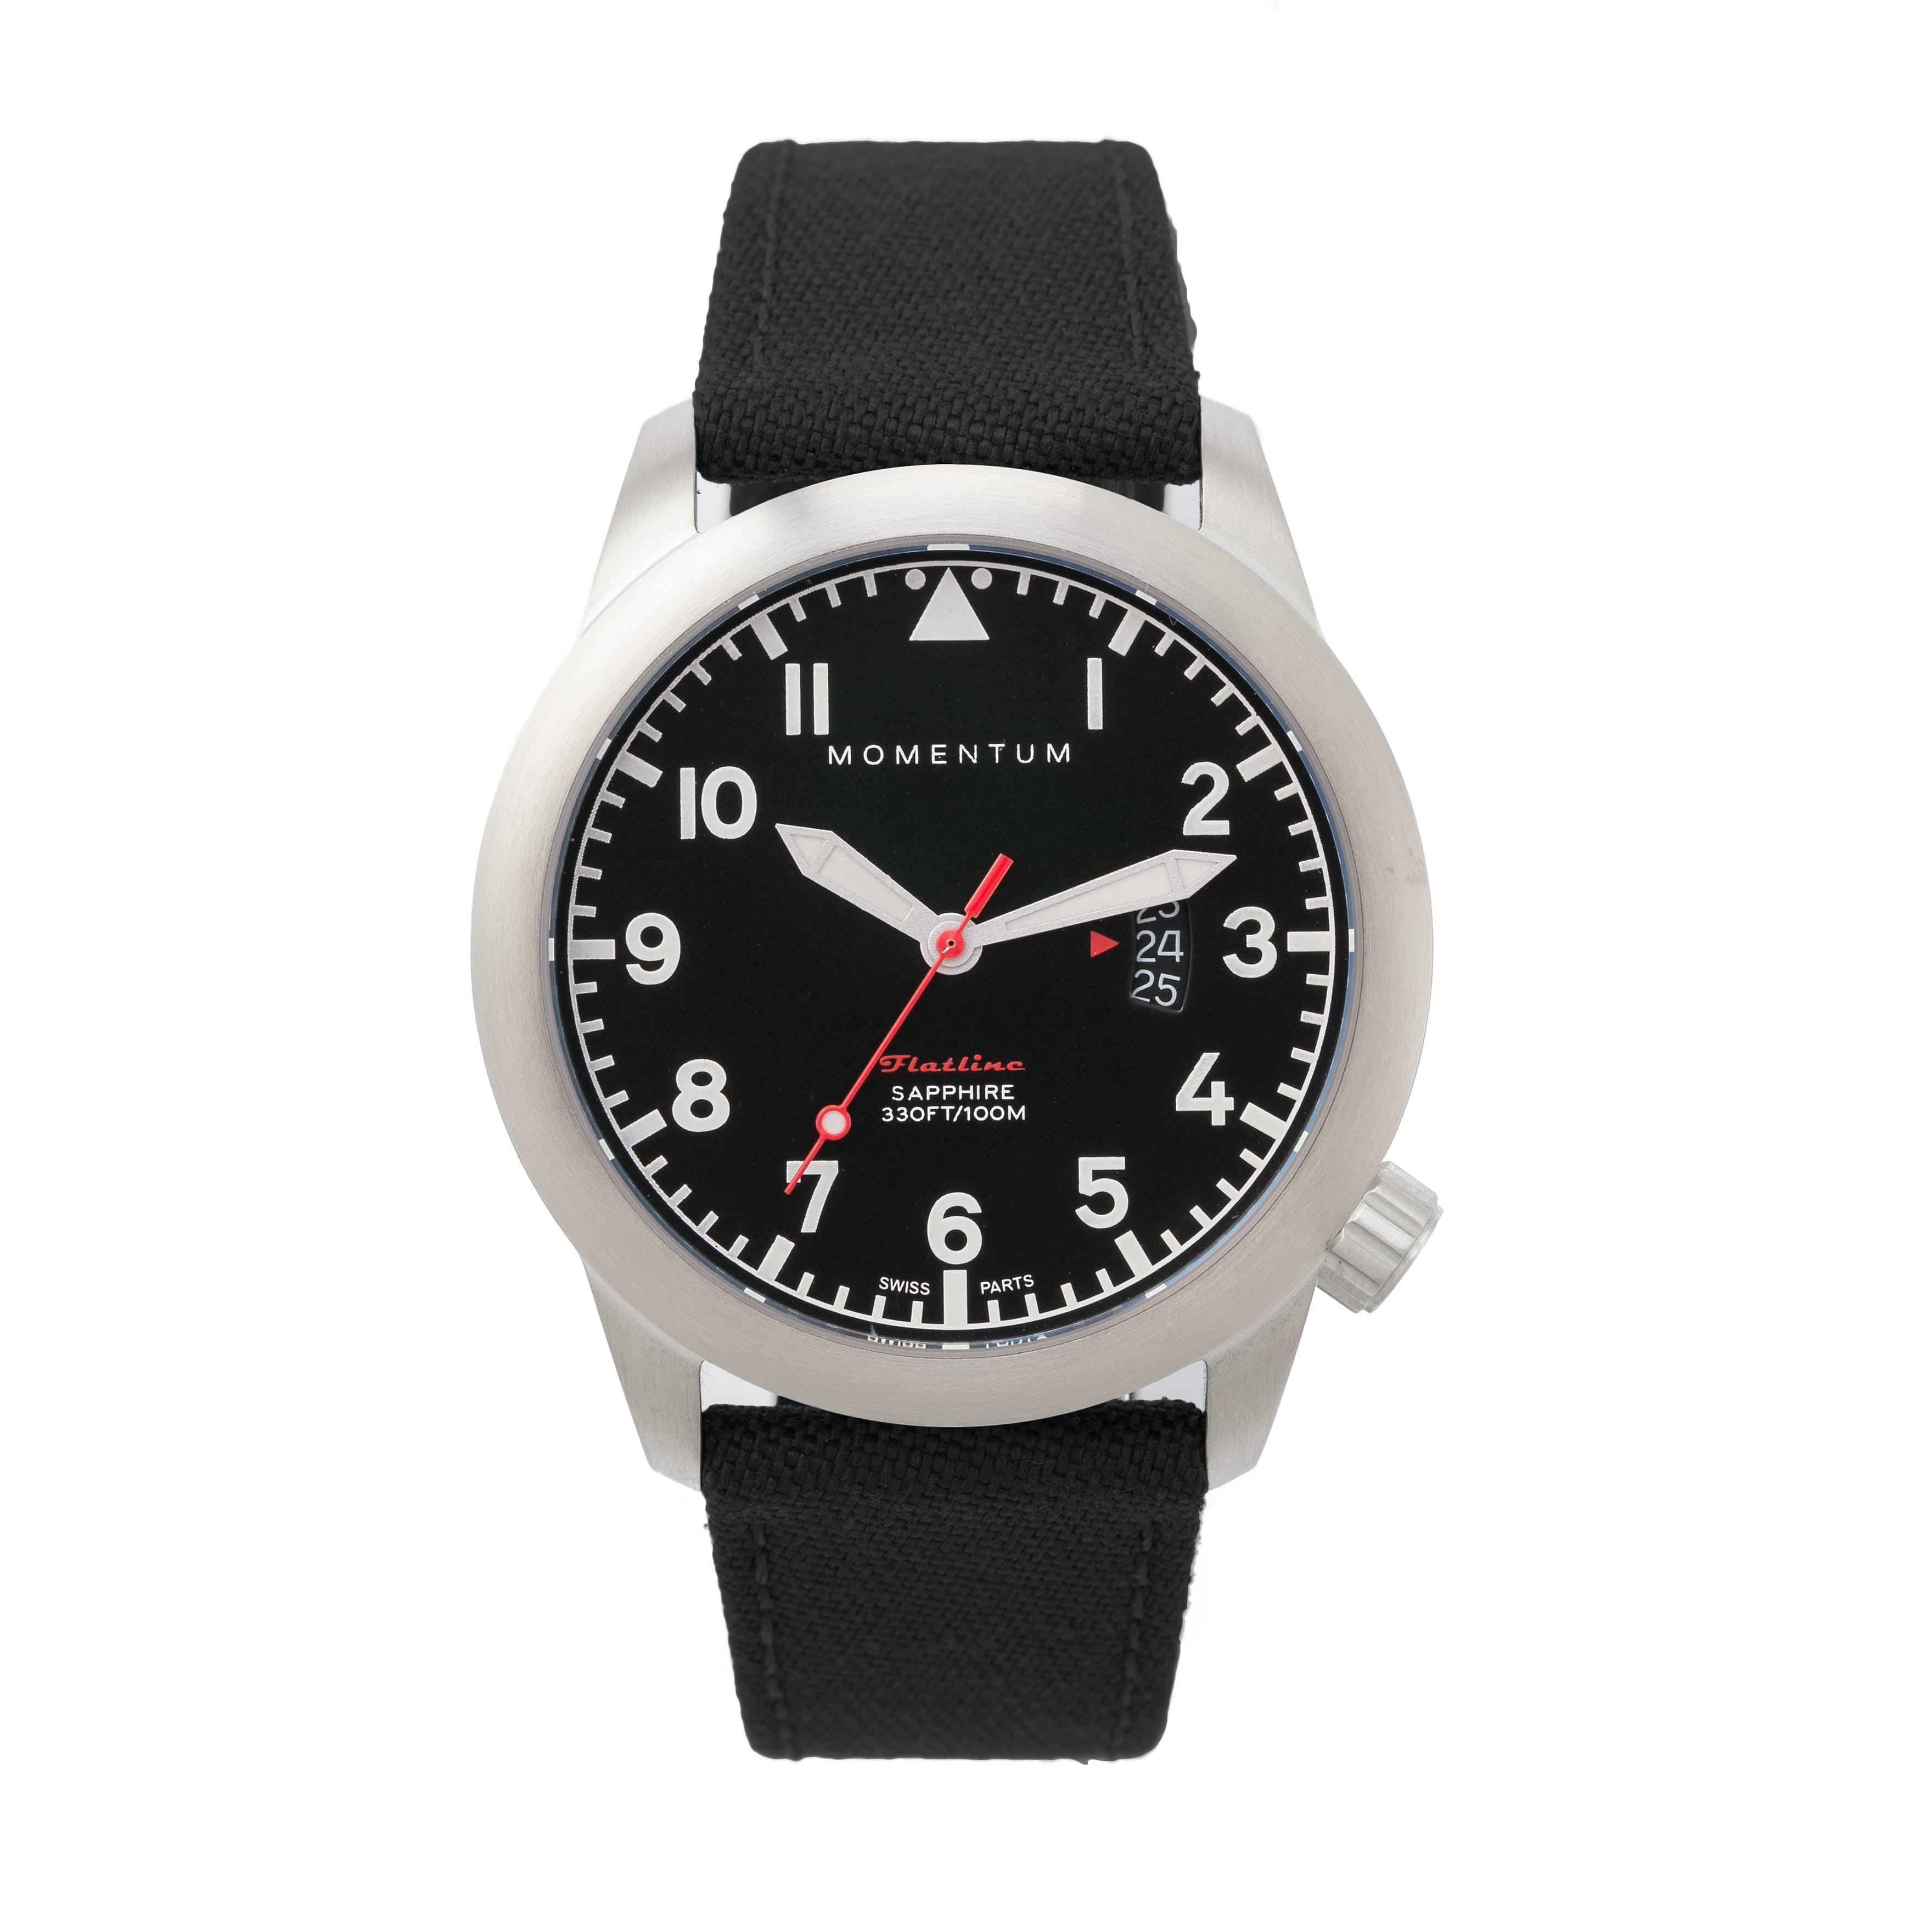 Ldlwzdbtdn momentum watches flatline 42 fabric 0 original